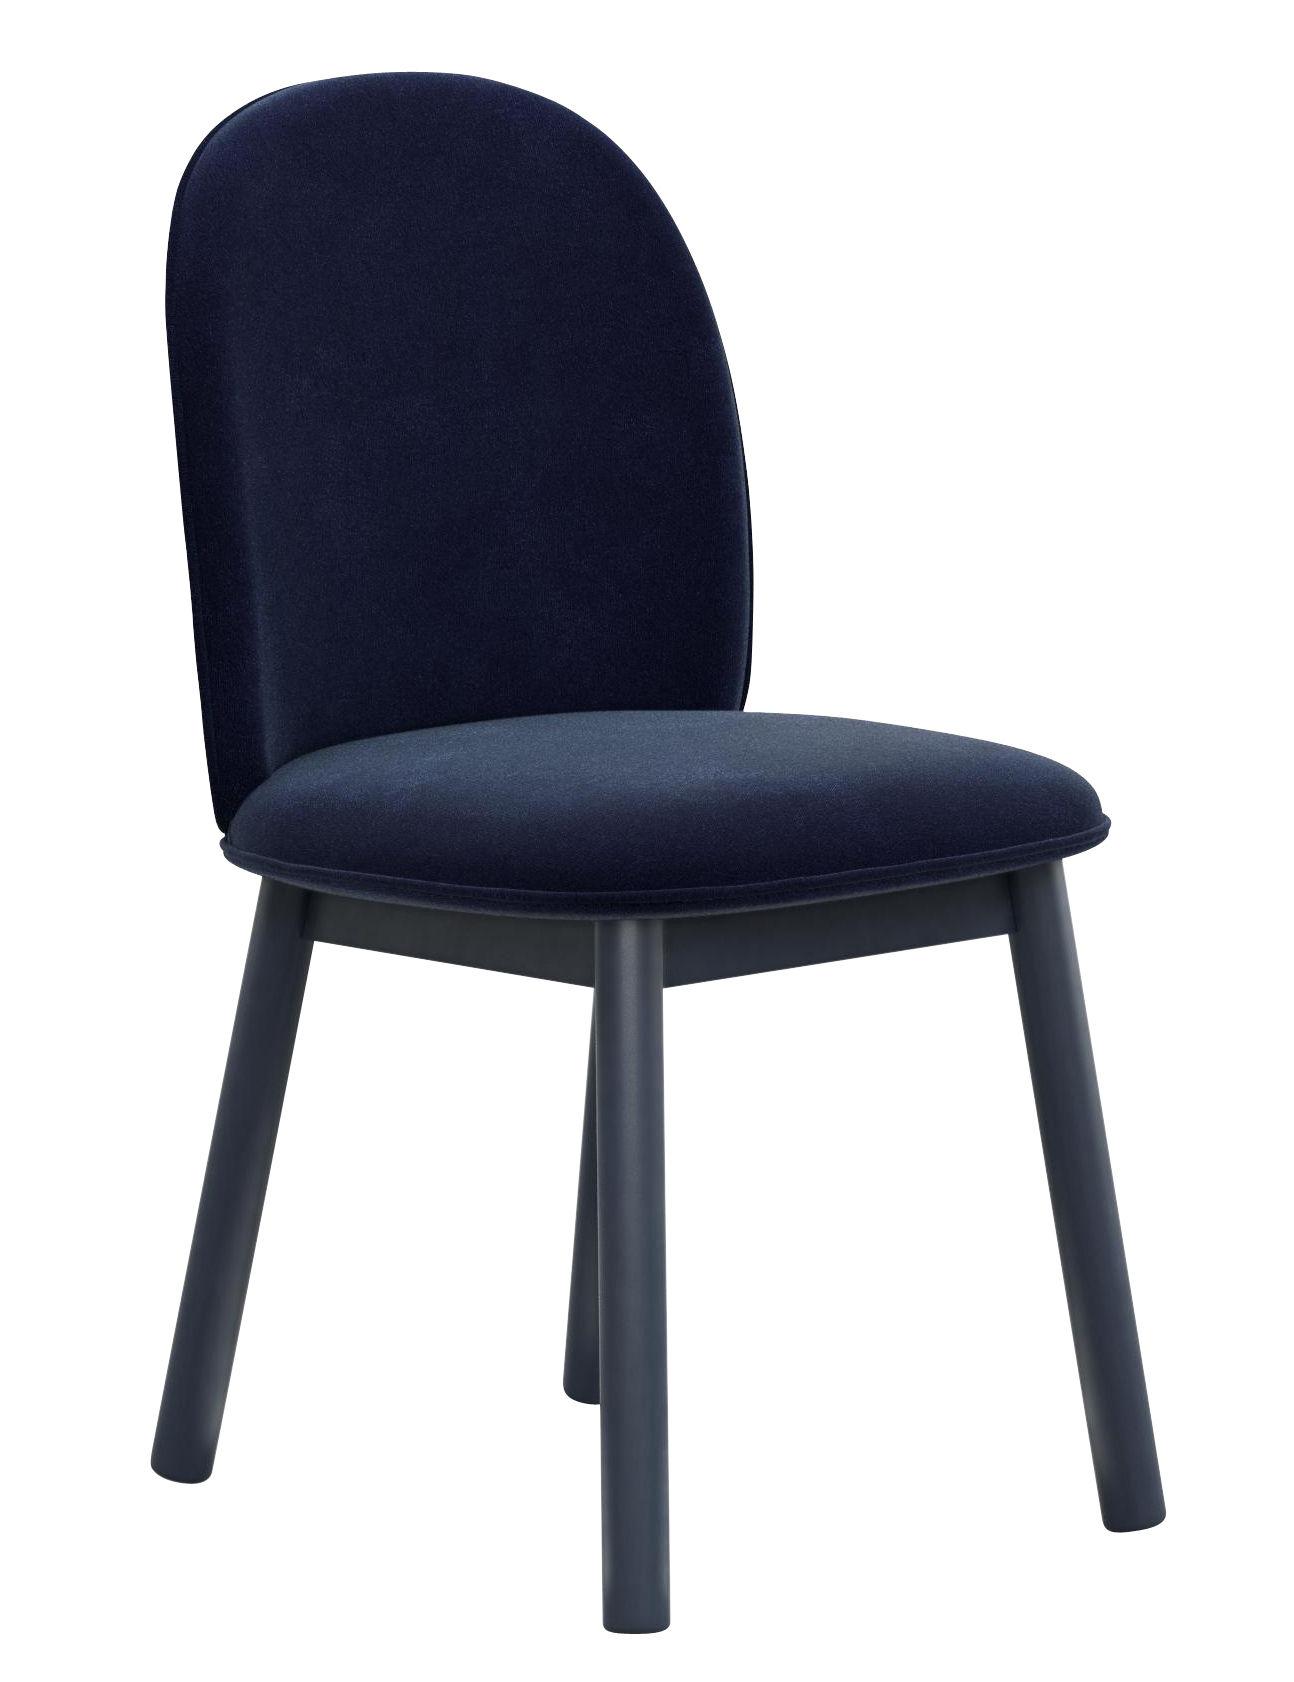 ace velours holz normann copenhagen gepolsterter stuhl. Black Bedroom Furniture Sets. Home Design Ideas